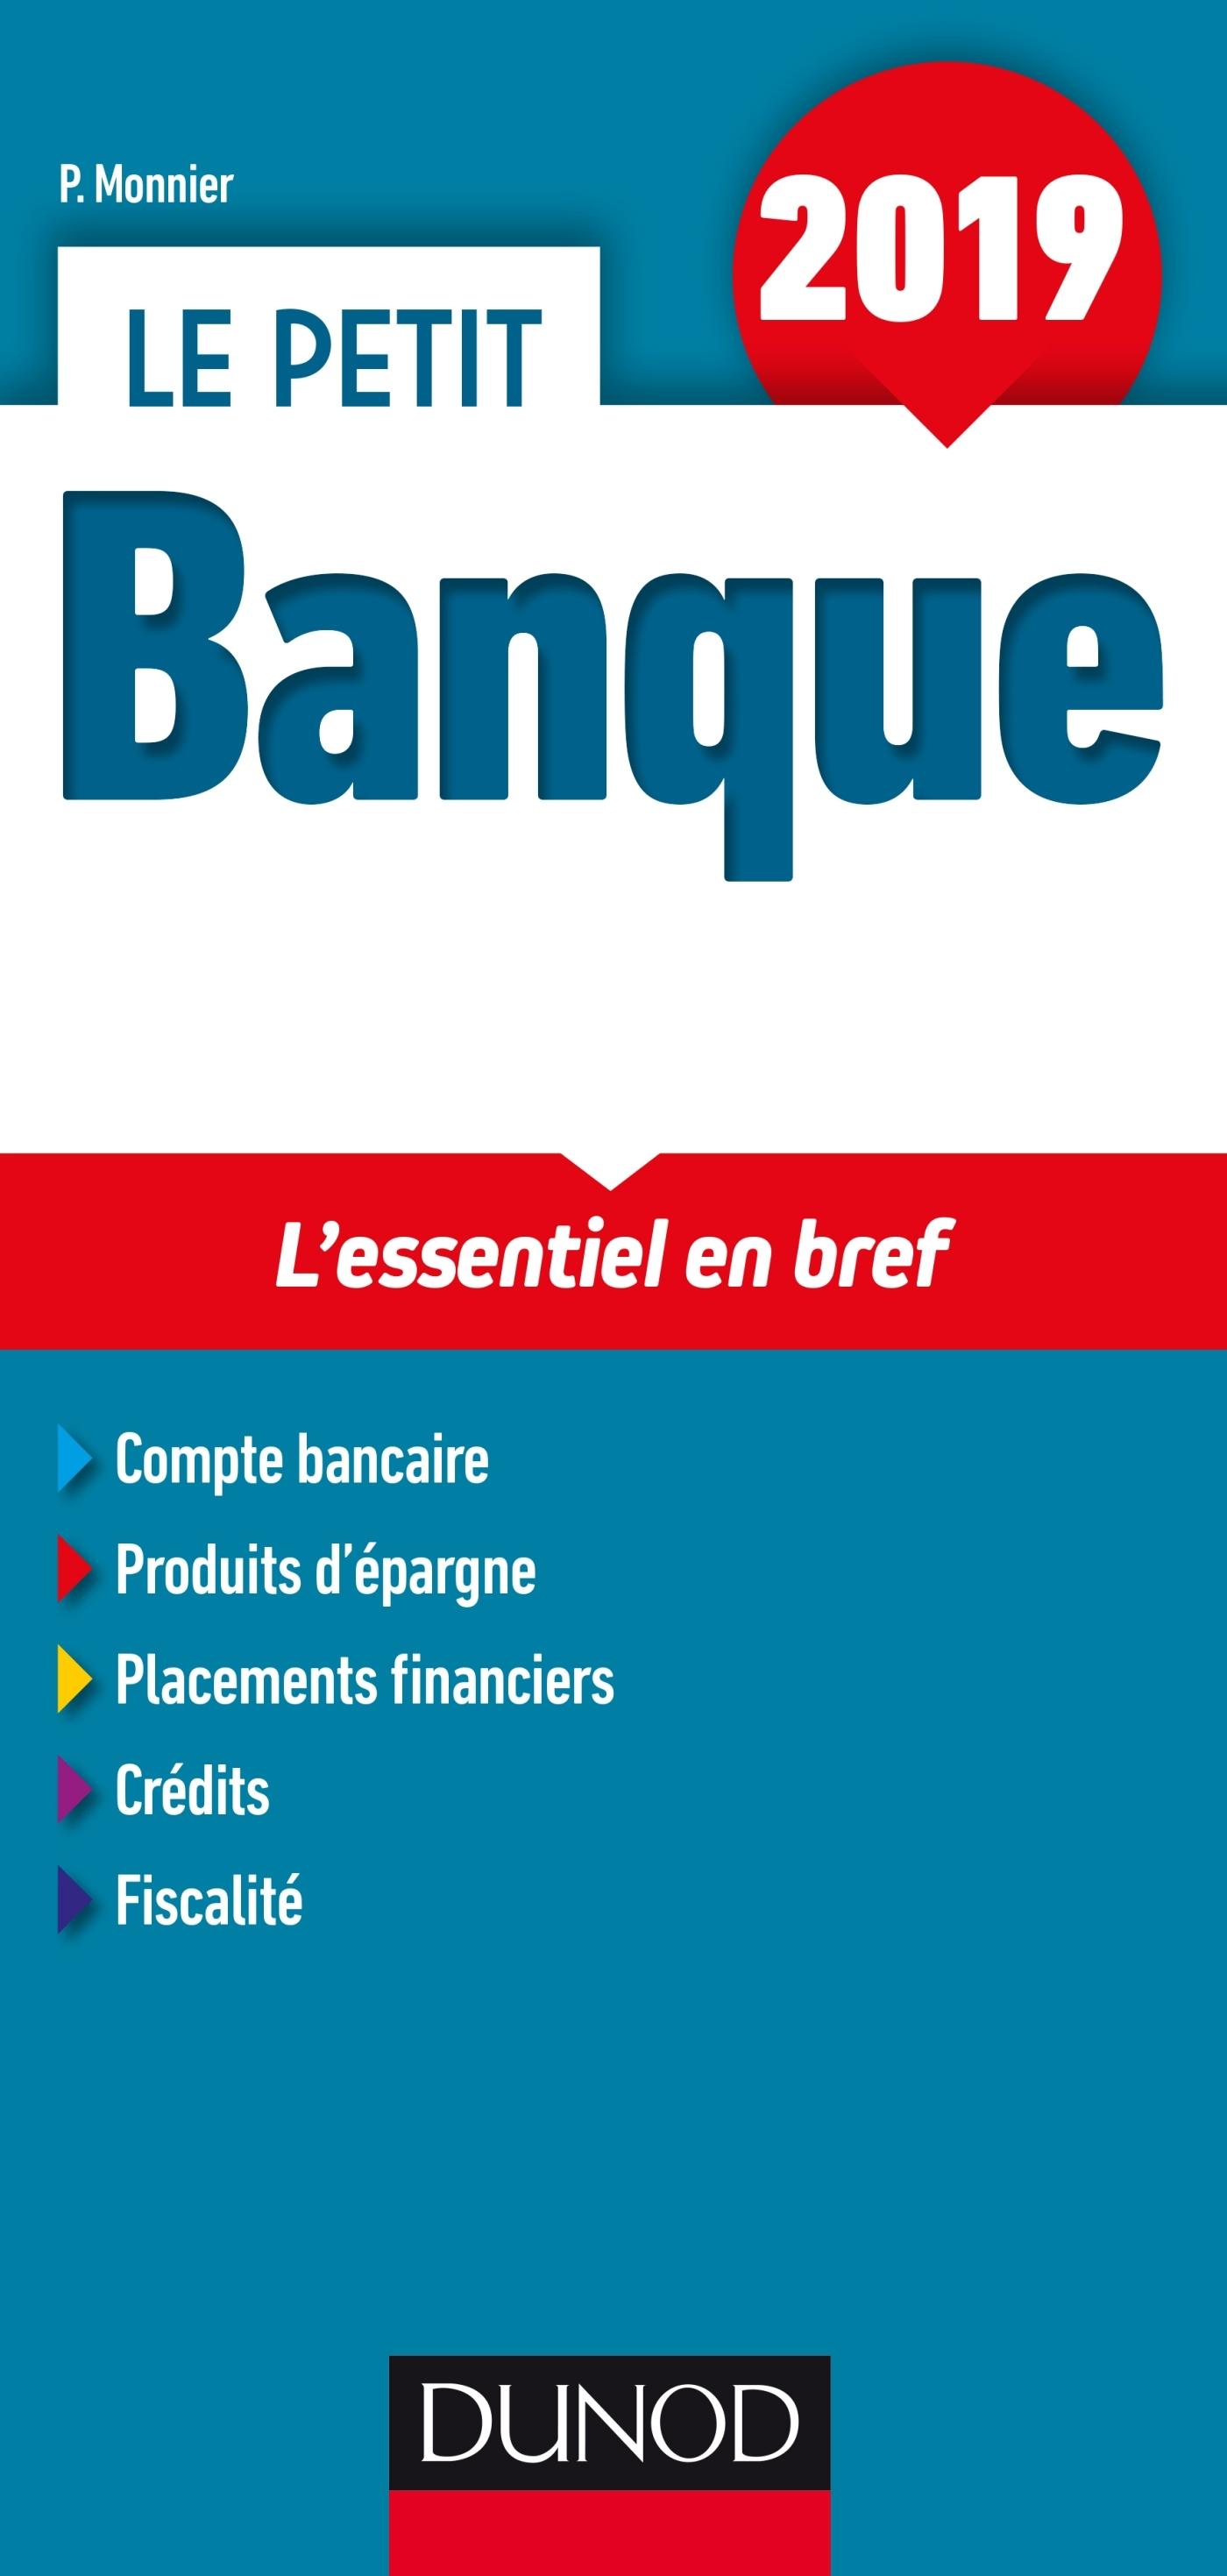 LE PETIT BANQUE 2019 - L'ESSENTIEL EN BREF